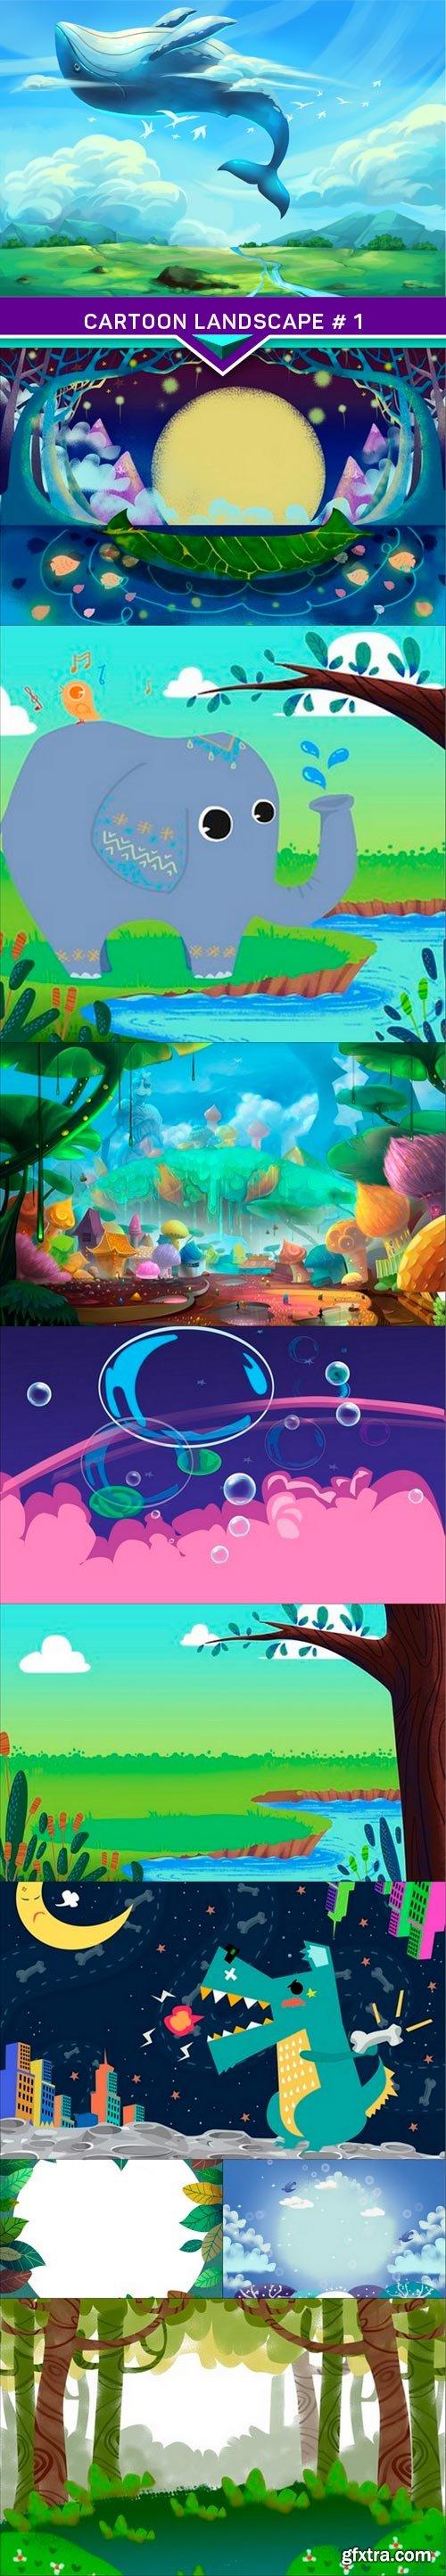 Cartoon landscape # 1 10x JPEG